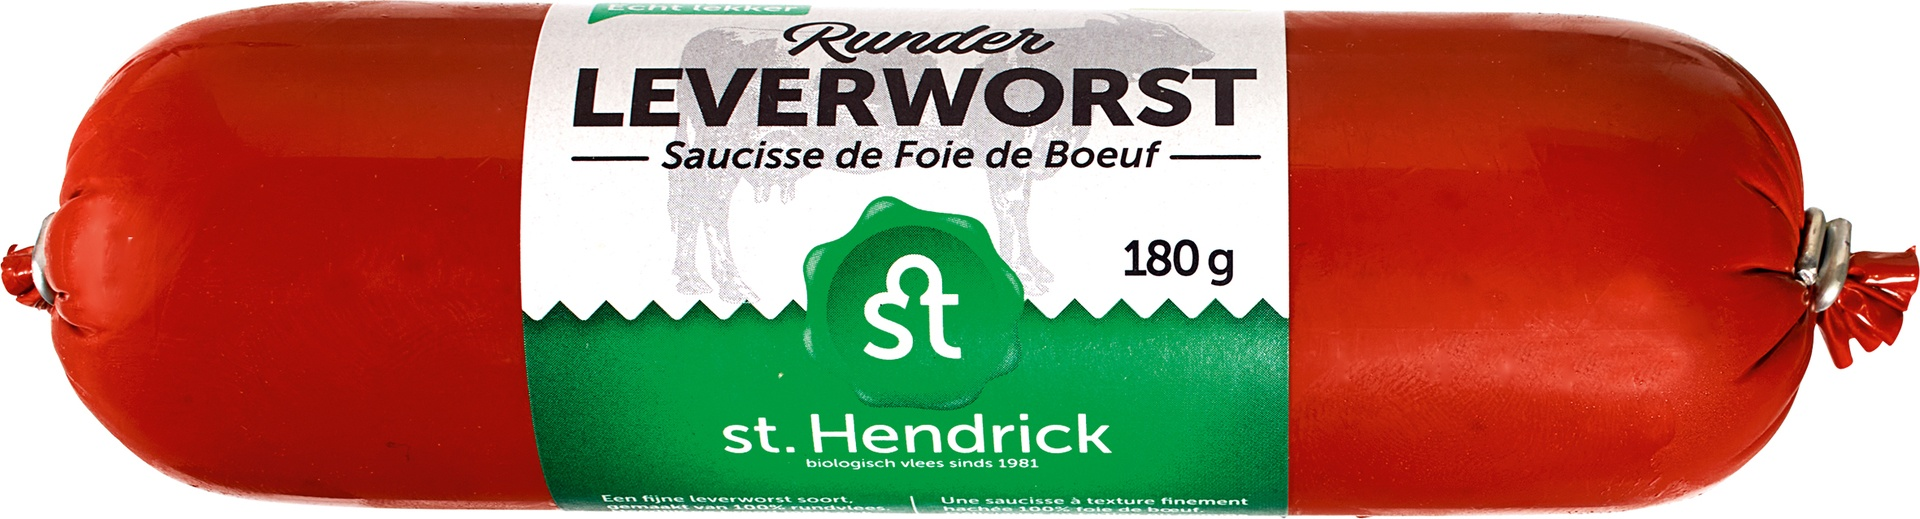 Biologische St. Hendrick Runderleverworst 180 gr